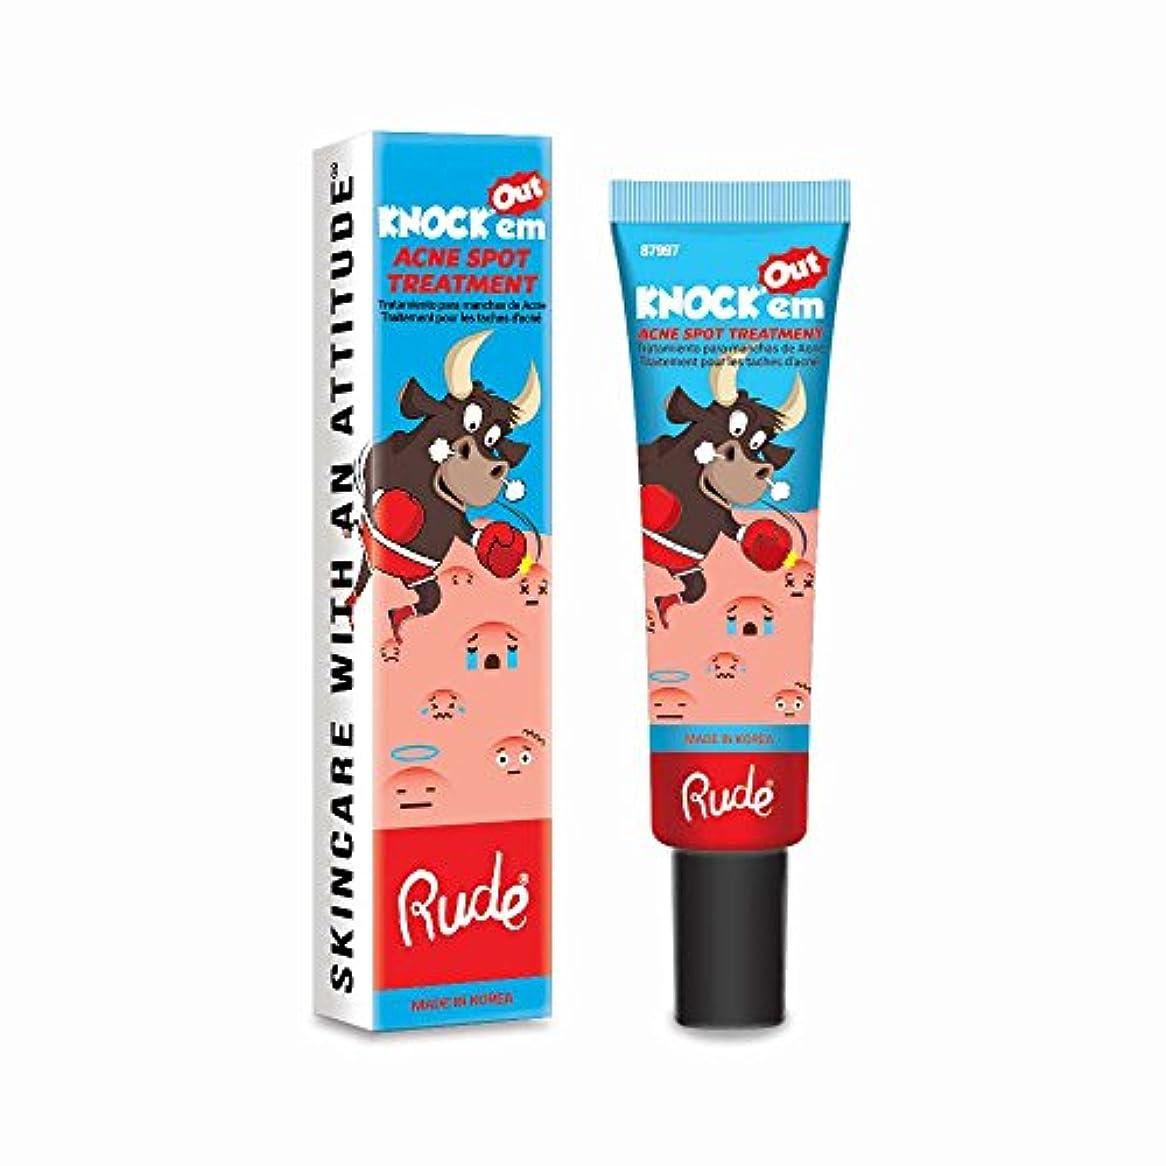 (6 Pack) RUDE Knock'em Acne Spot Treatment (並行輸入品)